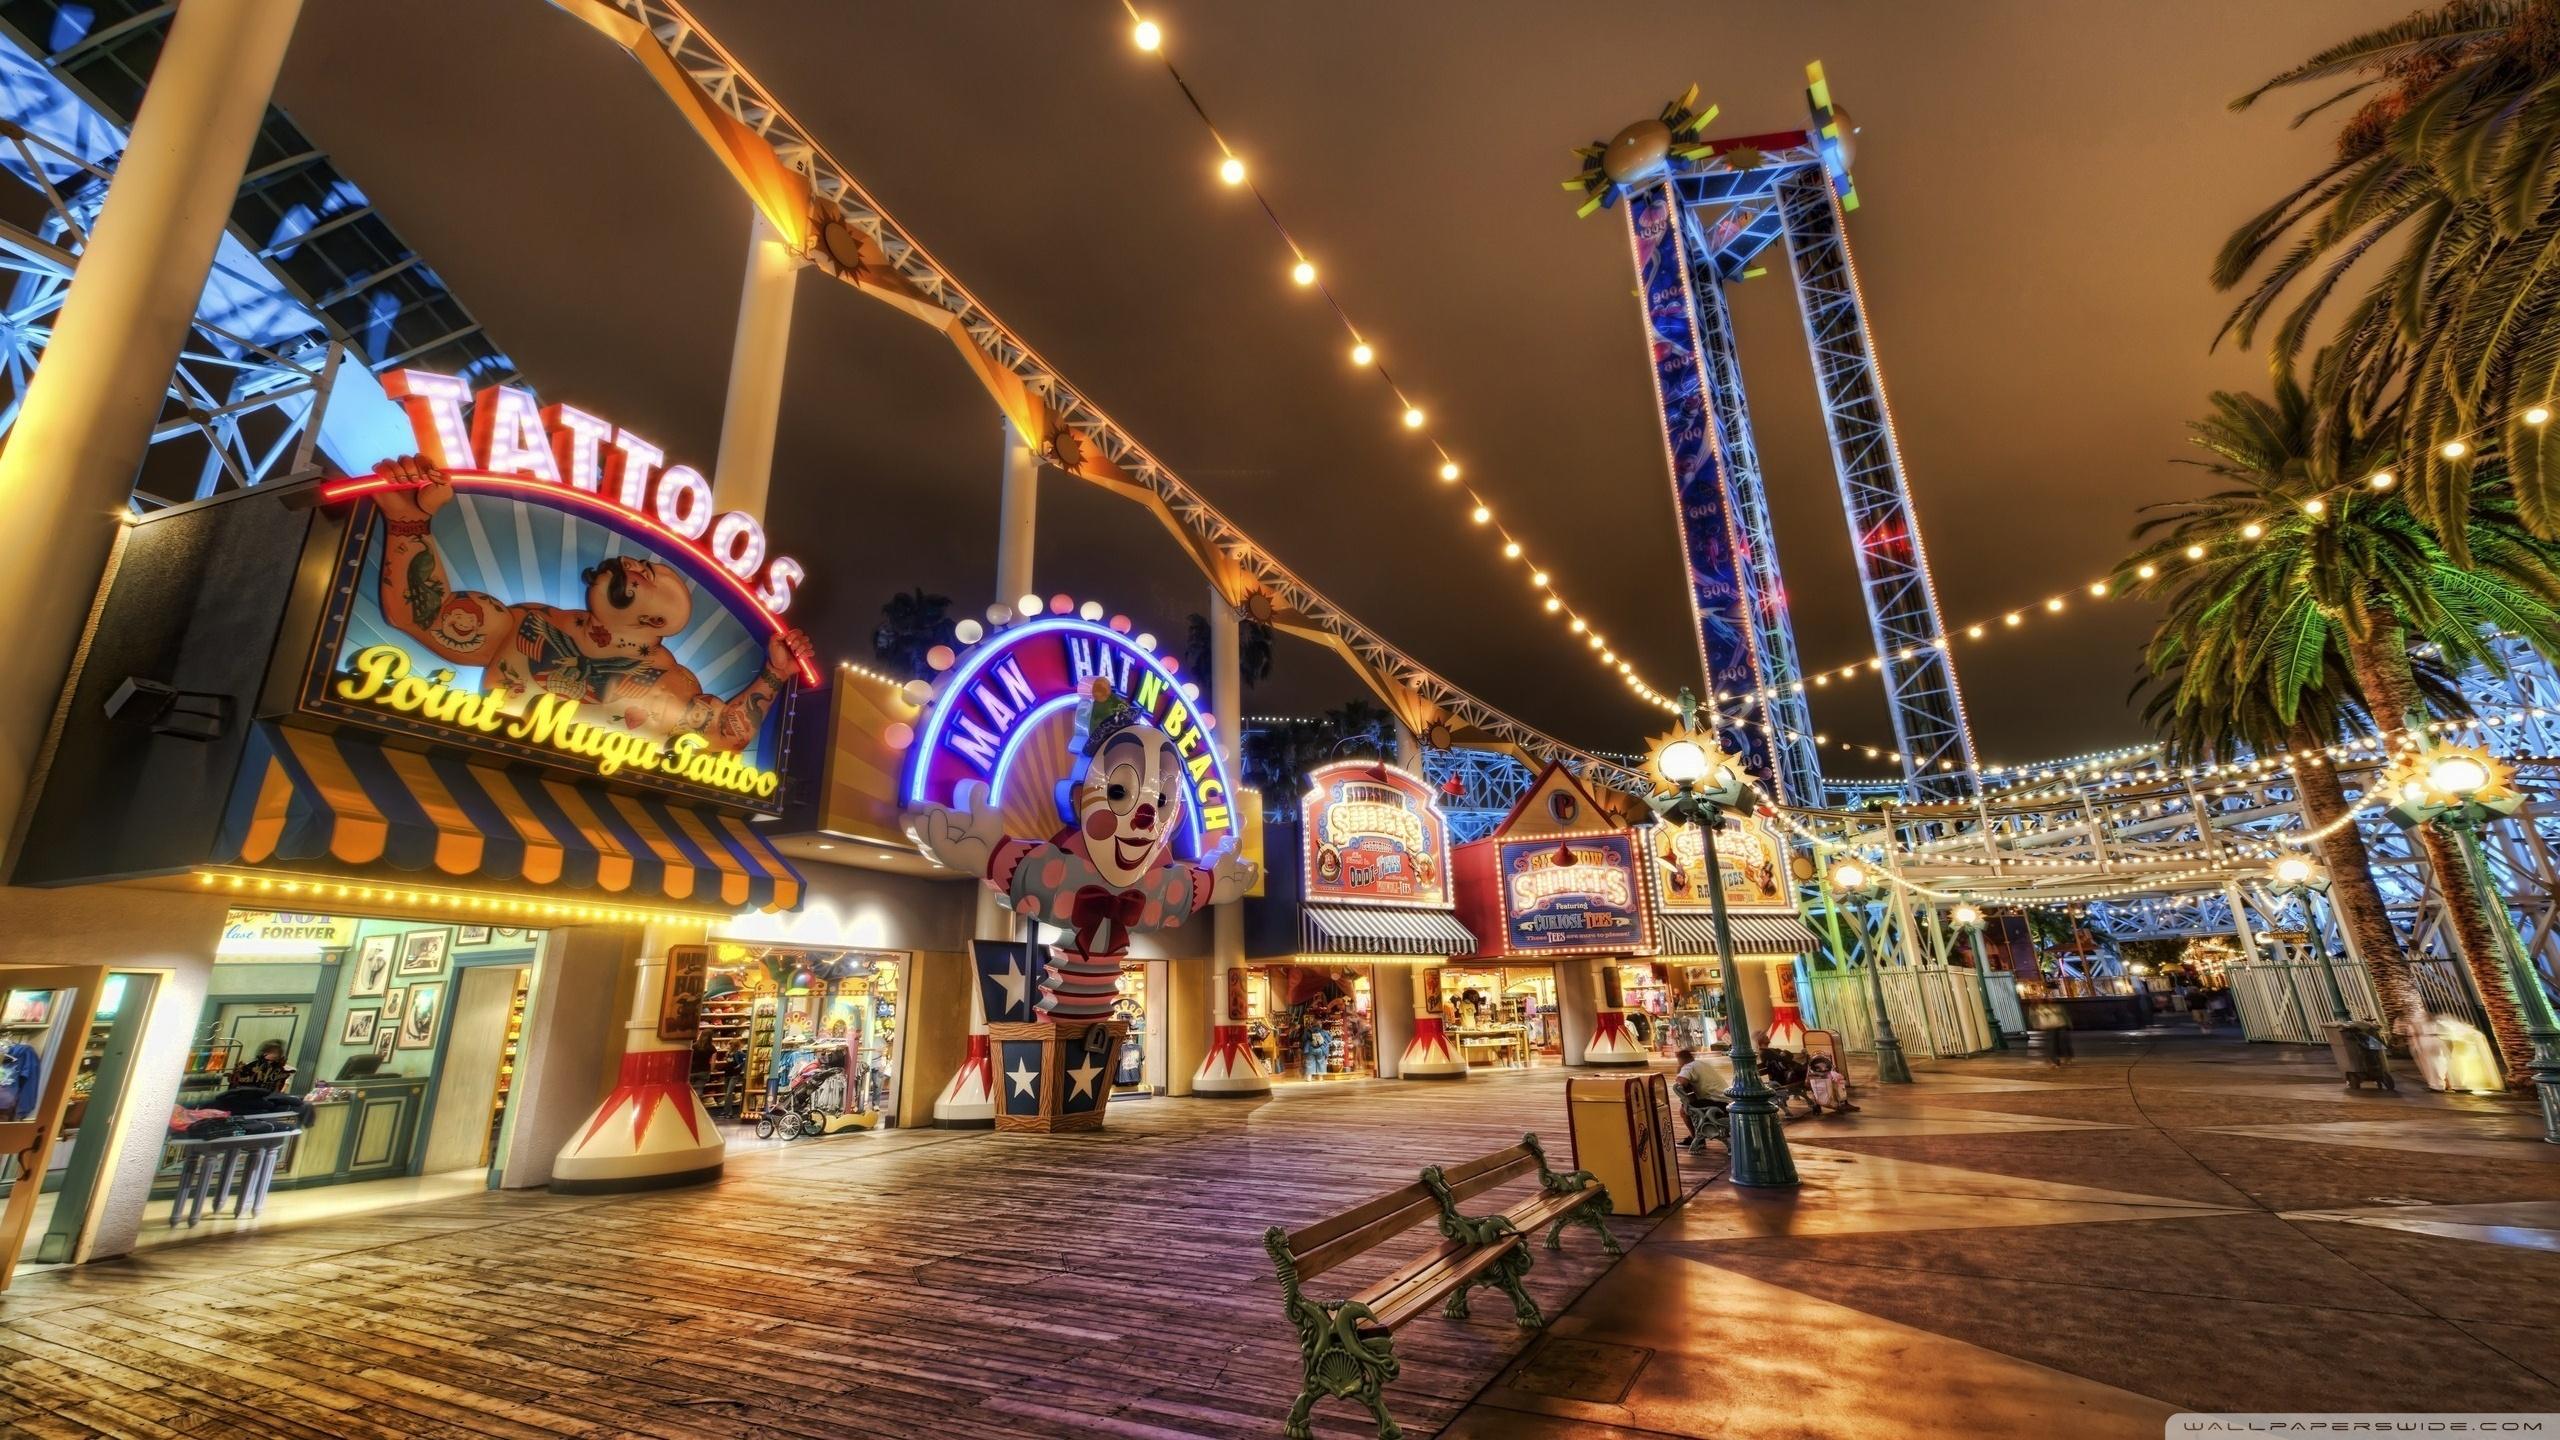 Amusement Park HDR 4K HD Desktop Wallpaper for 4K Ultra HD TV 2560x1440